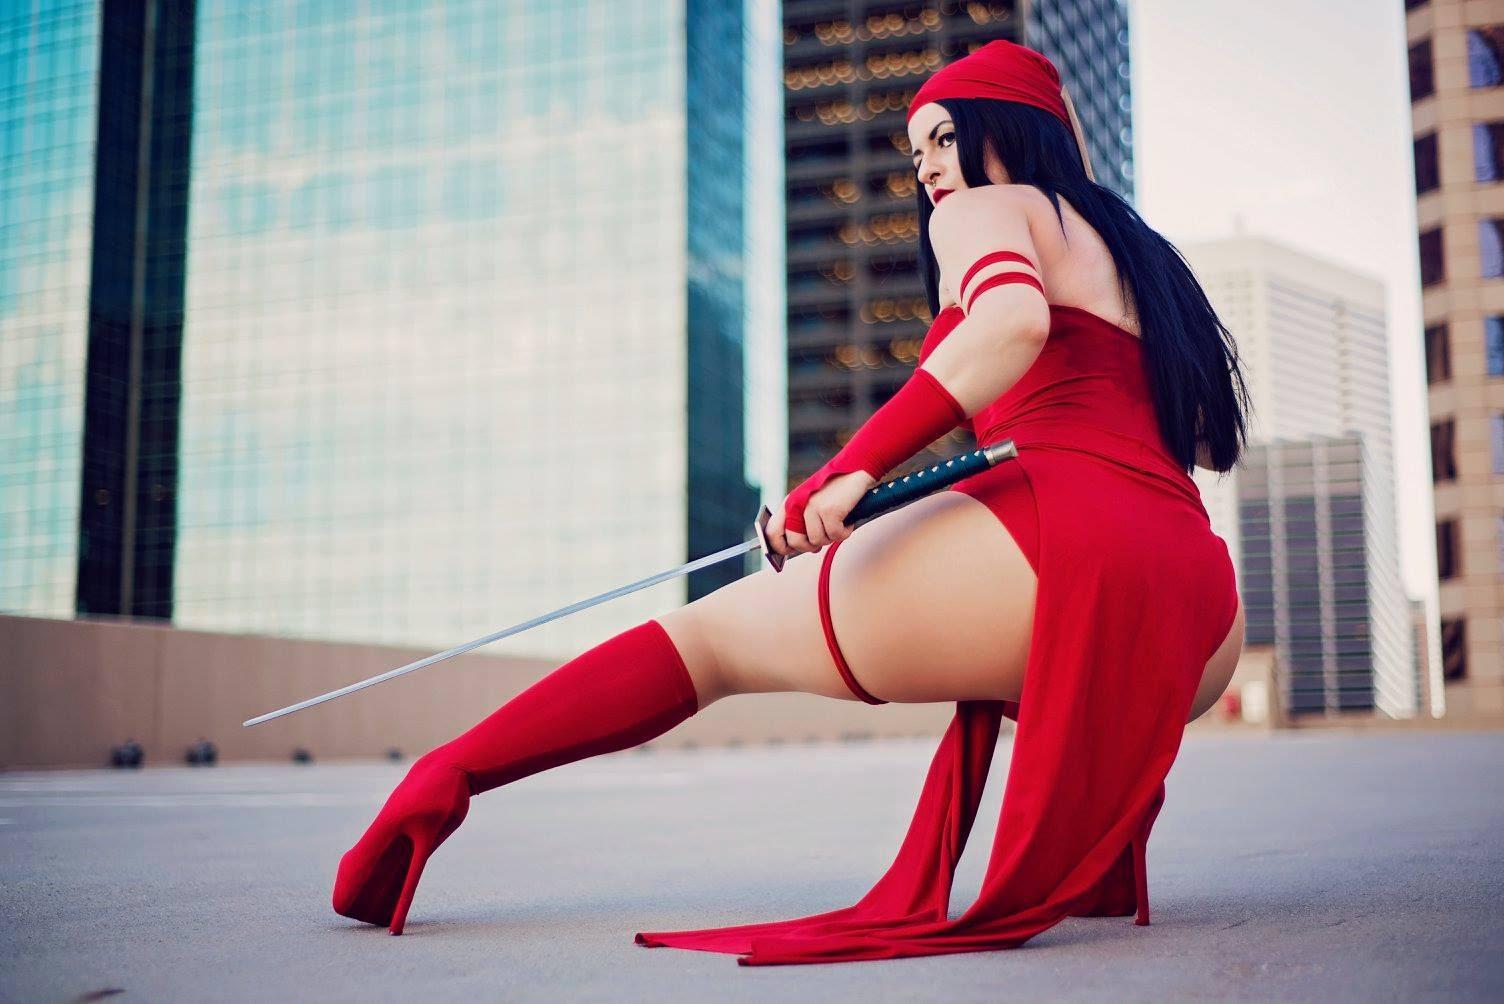 Model Christina McDaniel in Elektra cosplay